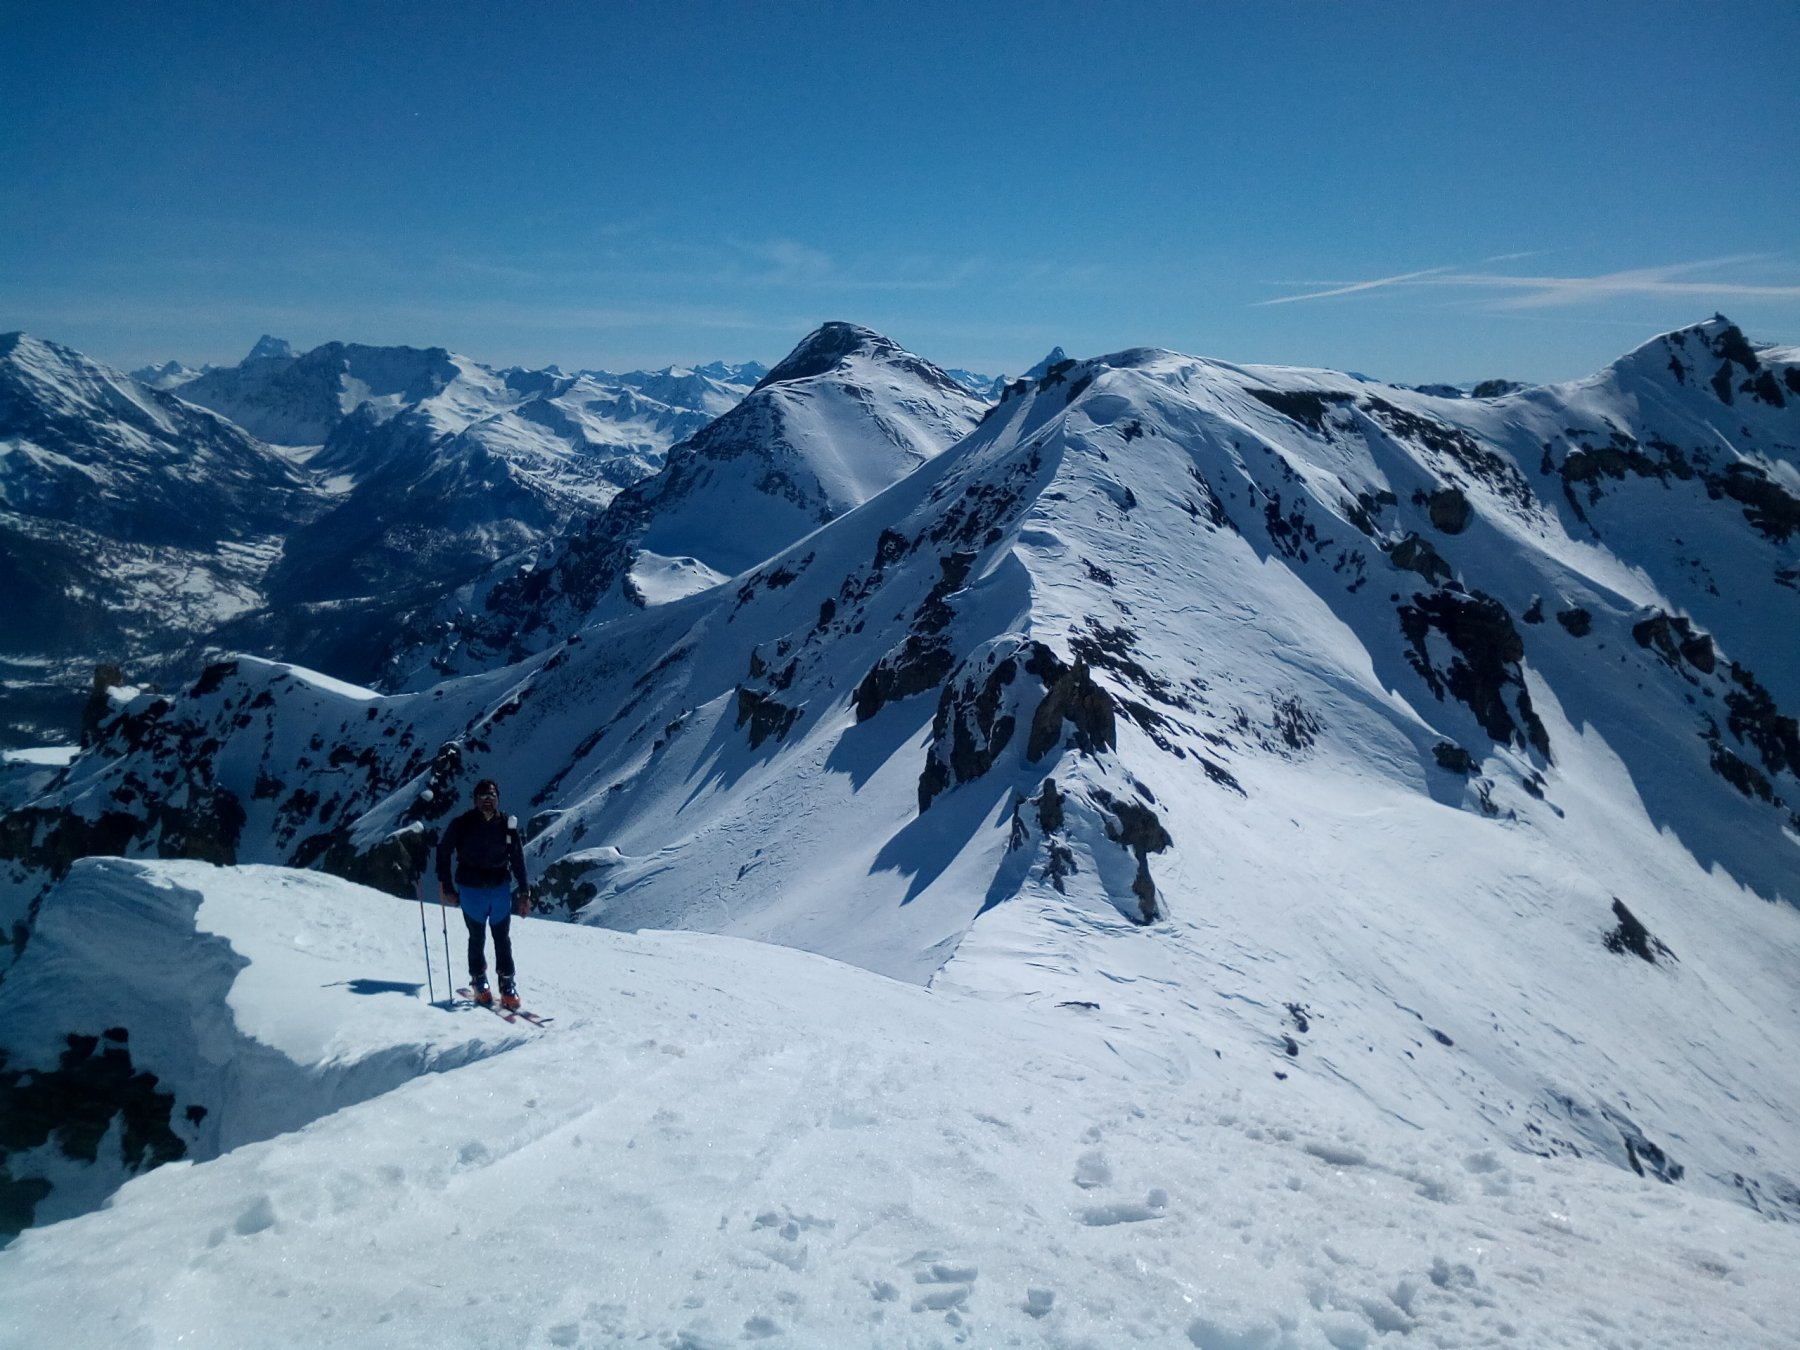 Chalanche Ronde (Punta di) da Pra Claud 2019-02-24